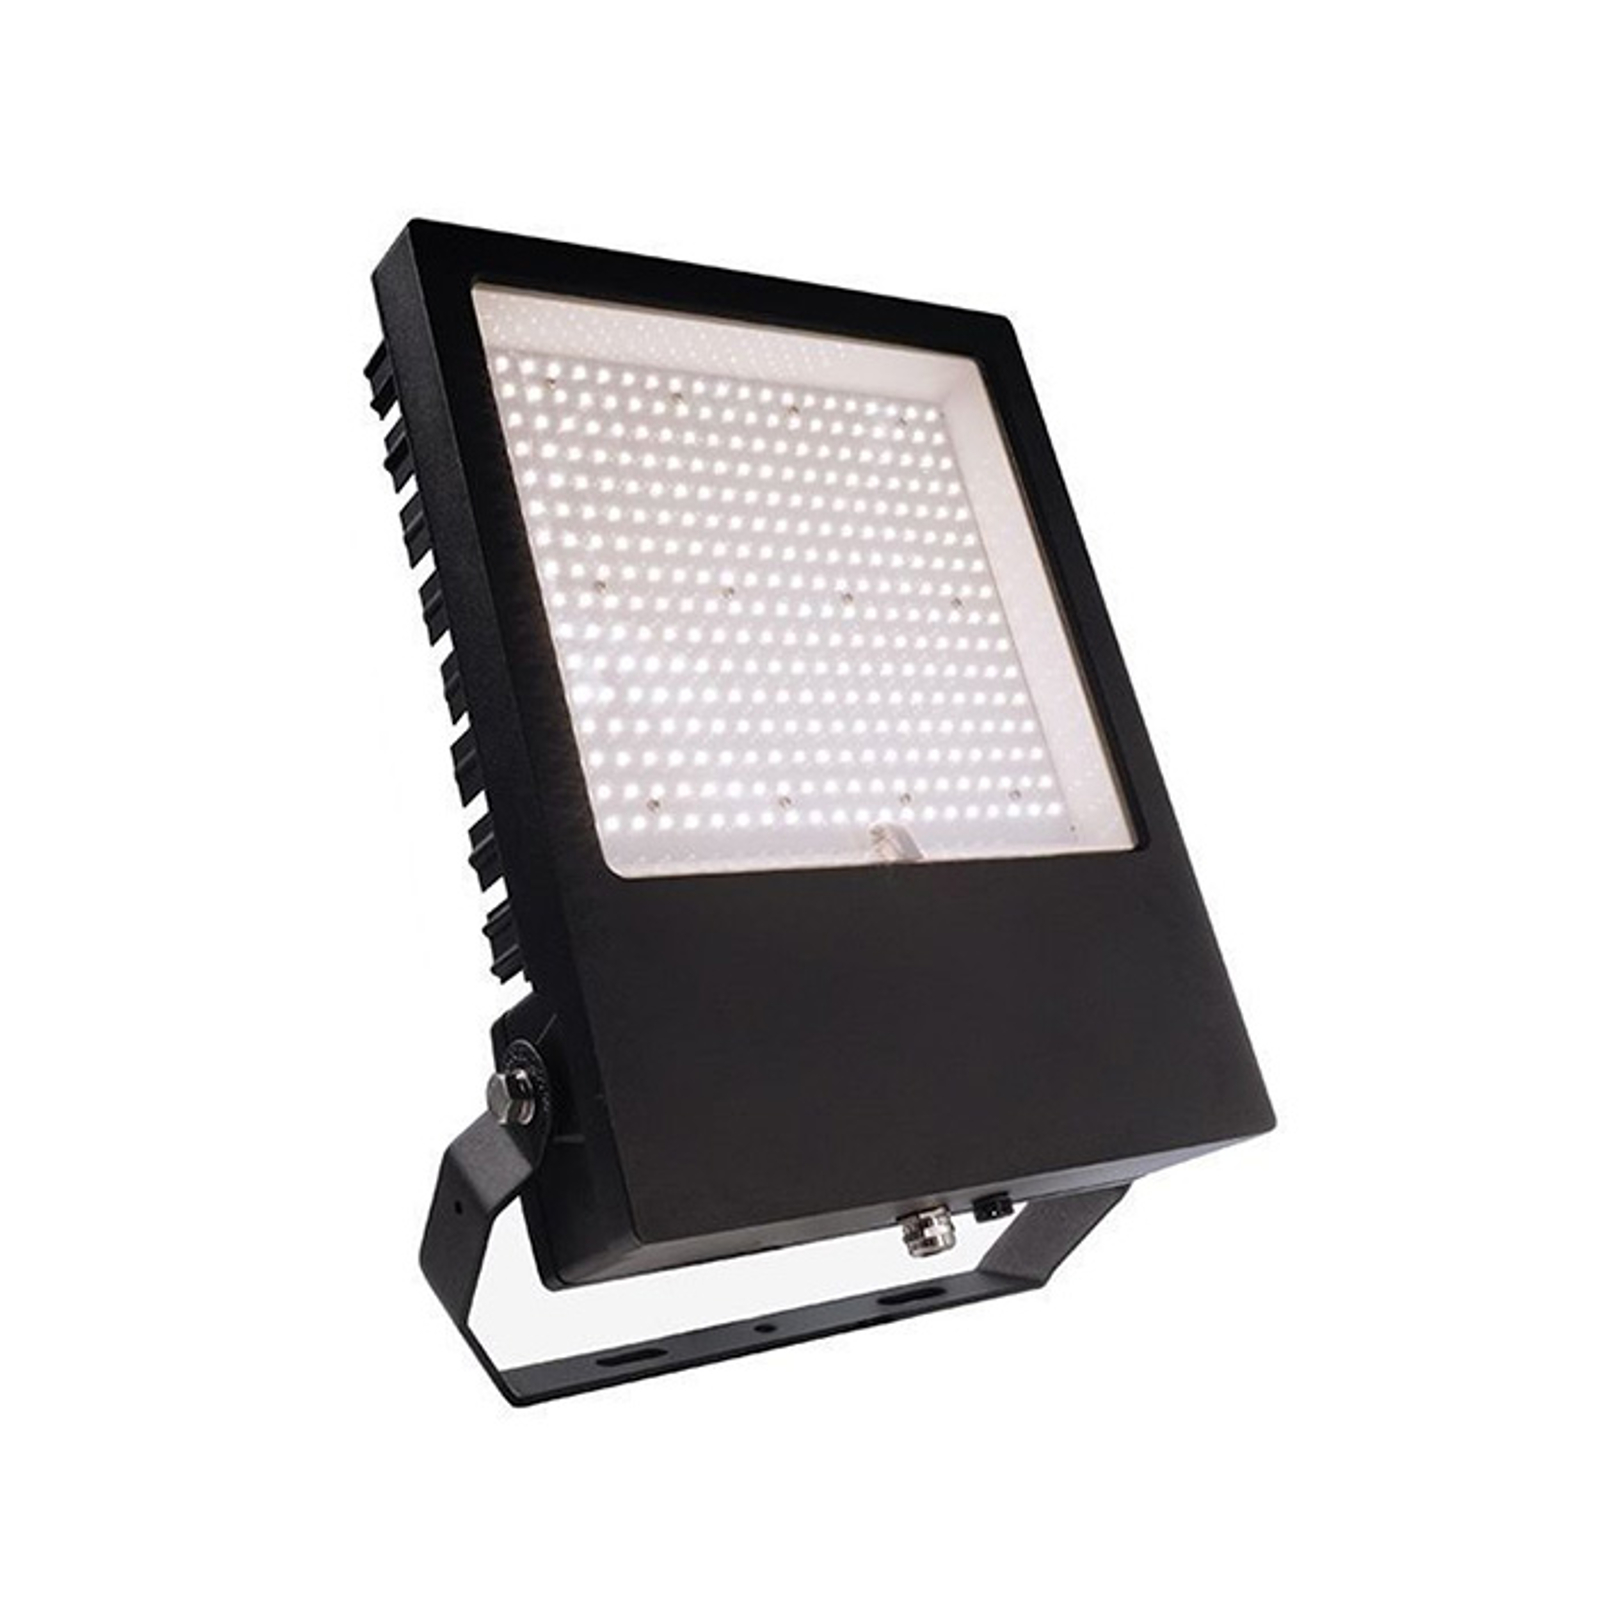 LED-Außenstrahler Atik, 300 W, 5.000 K